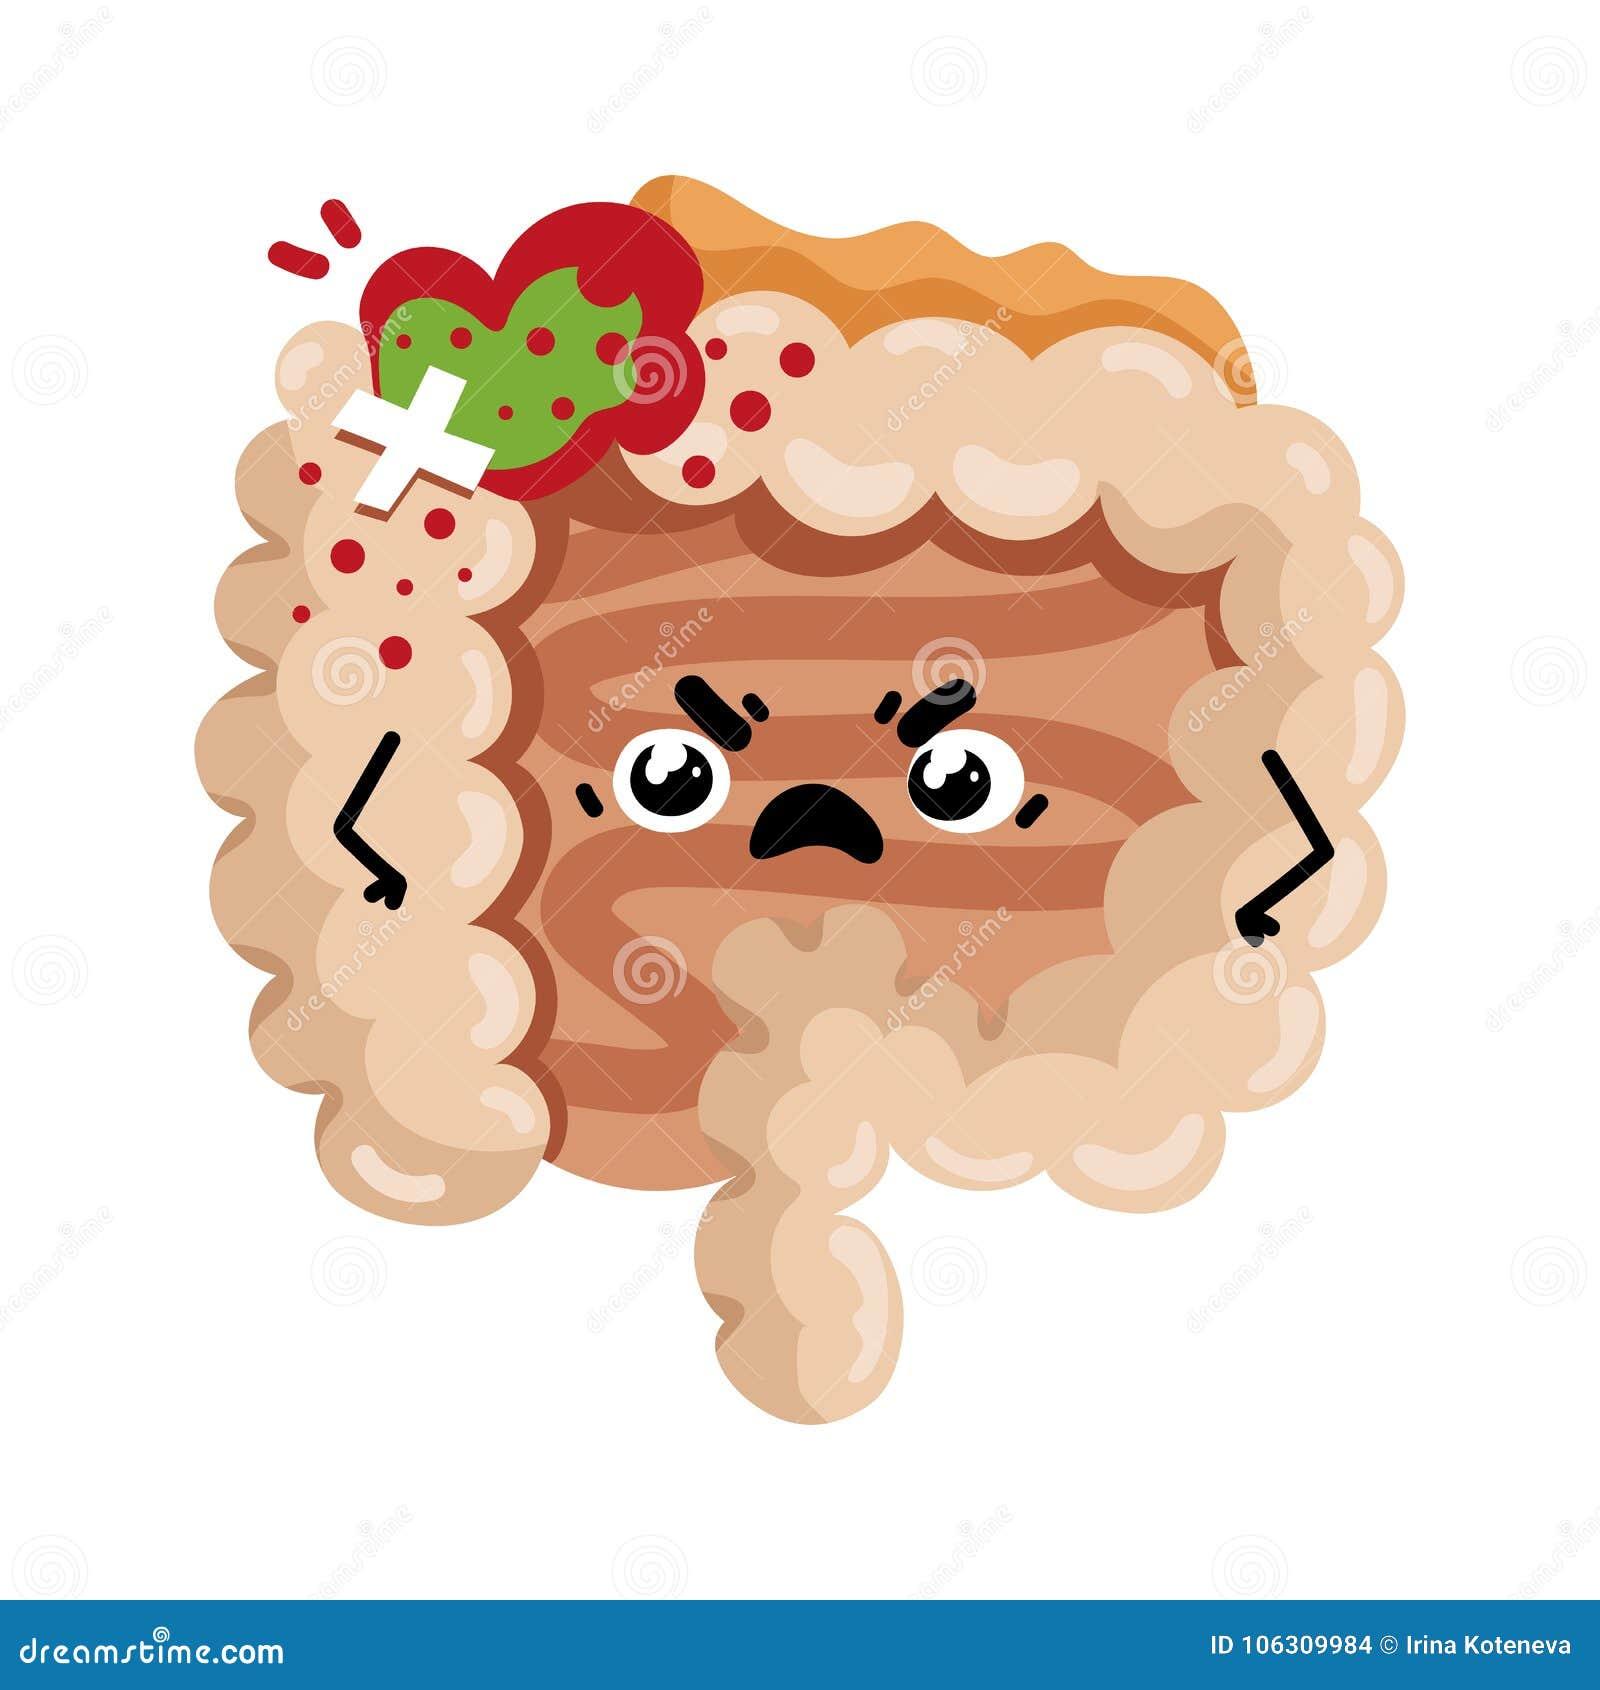 Human Sick Intestine Cartoon Character Stock Vector Illustration